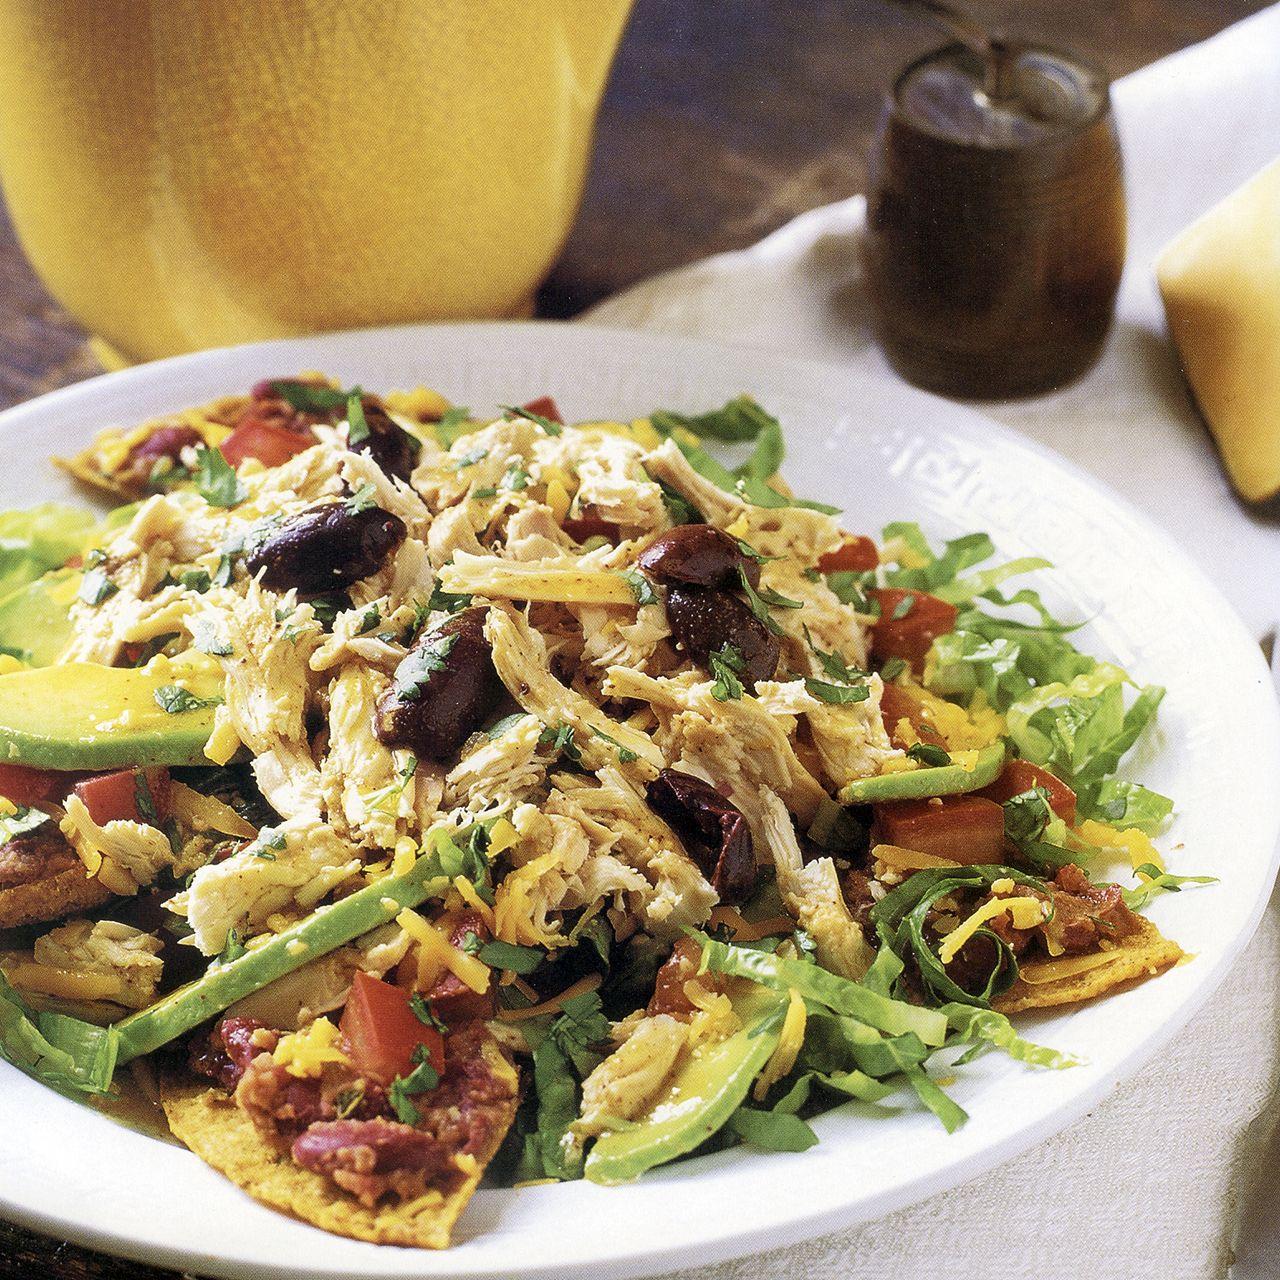 Southwestern Tortilla Salad